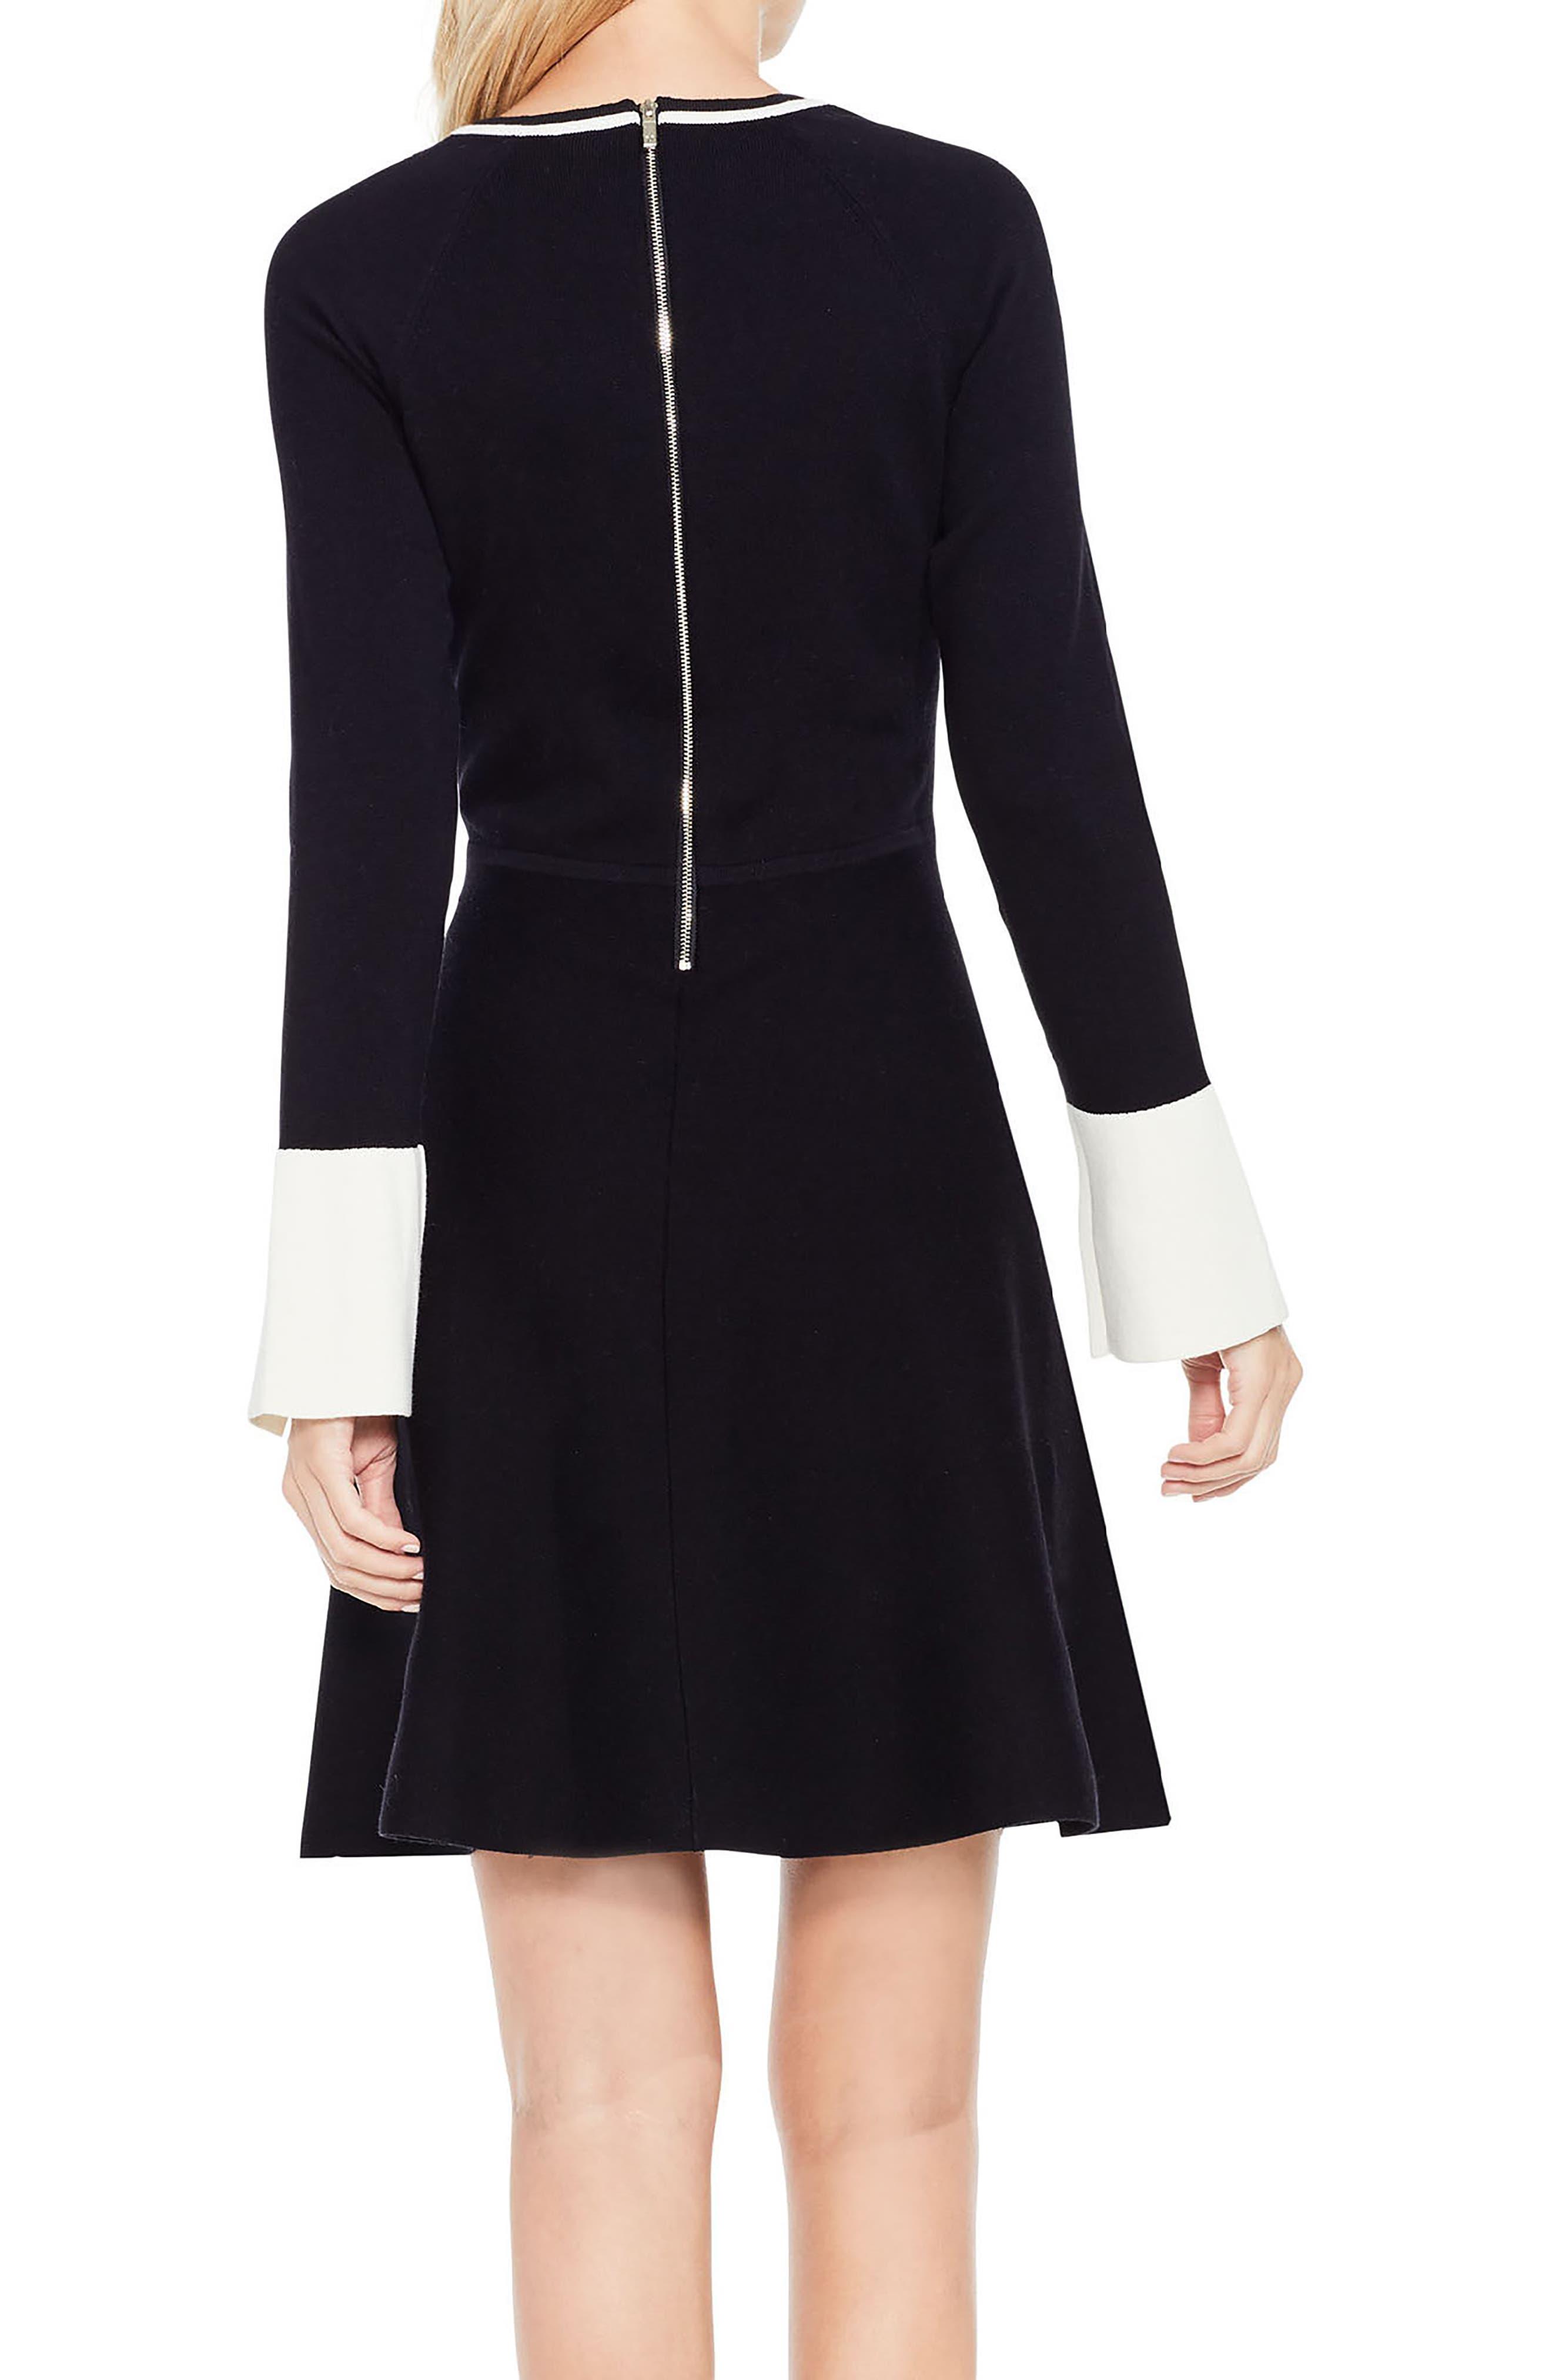 Alternate Image 3  - Vince Camuto Fit & Flare Sweater Dress (Regular & Petite)